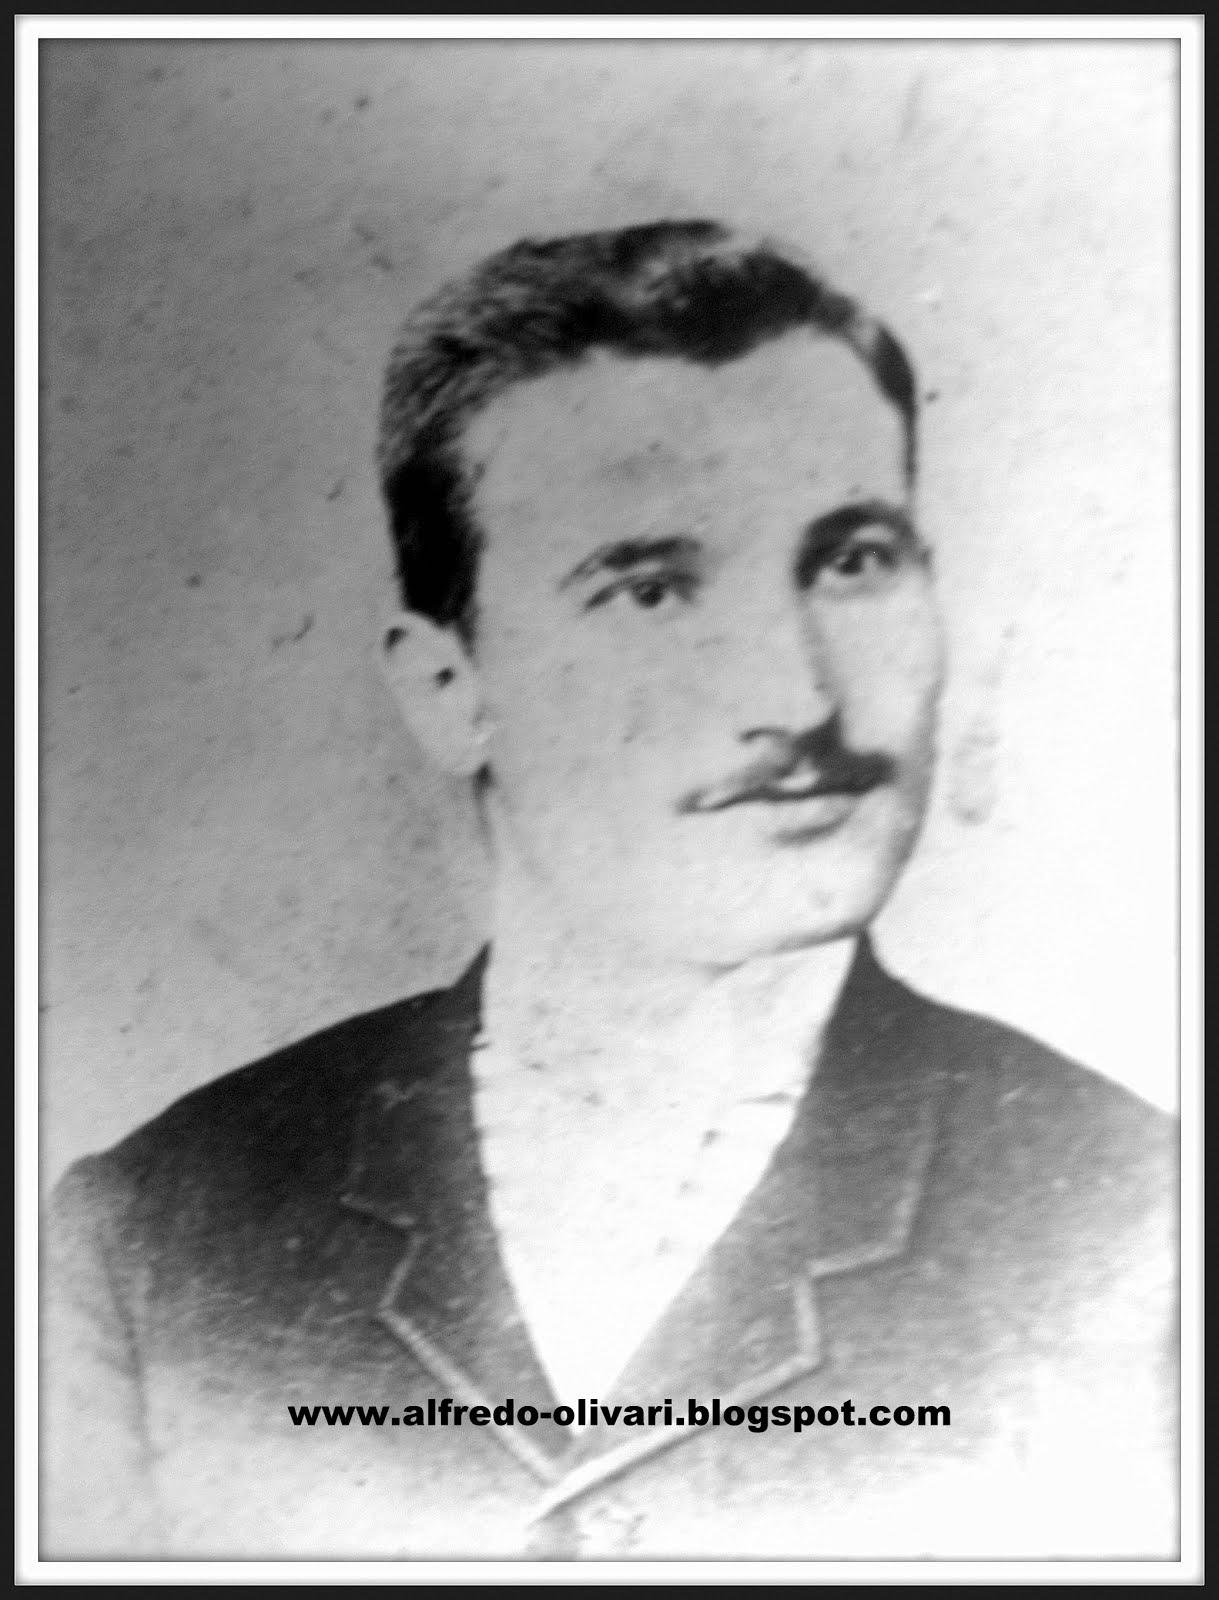 Arquitecto Alfredo Olivari (Liorna 1867- Sin datos)